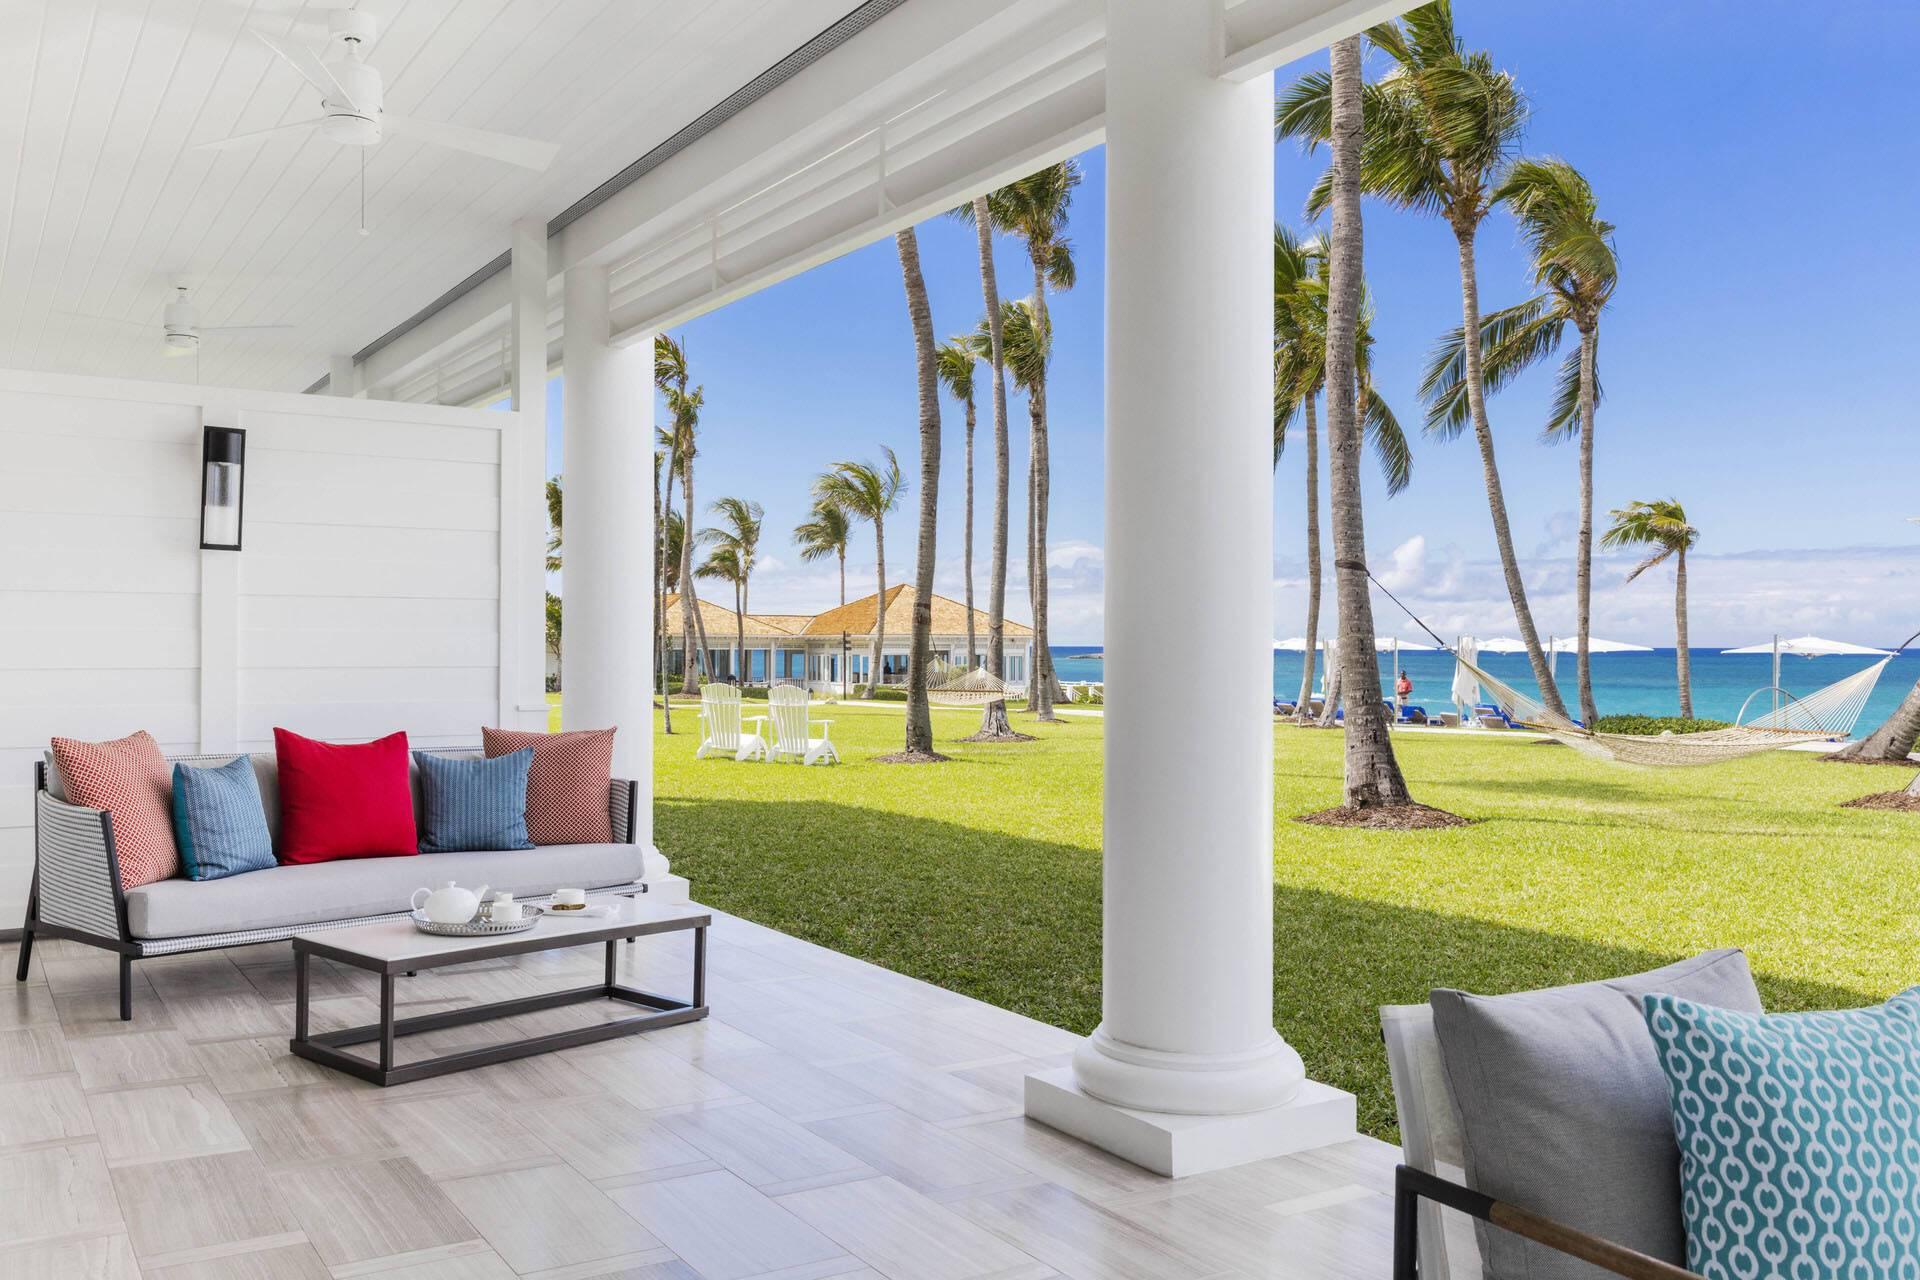 Ocean Club Four Seasons Bahamas Suite Terrasse